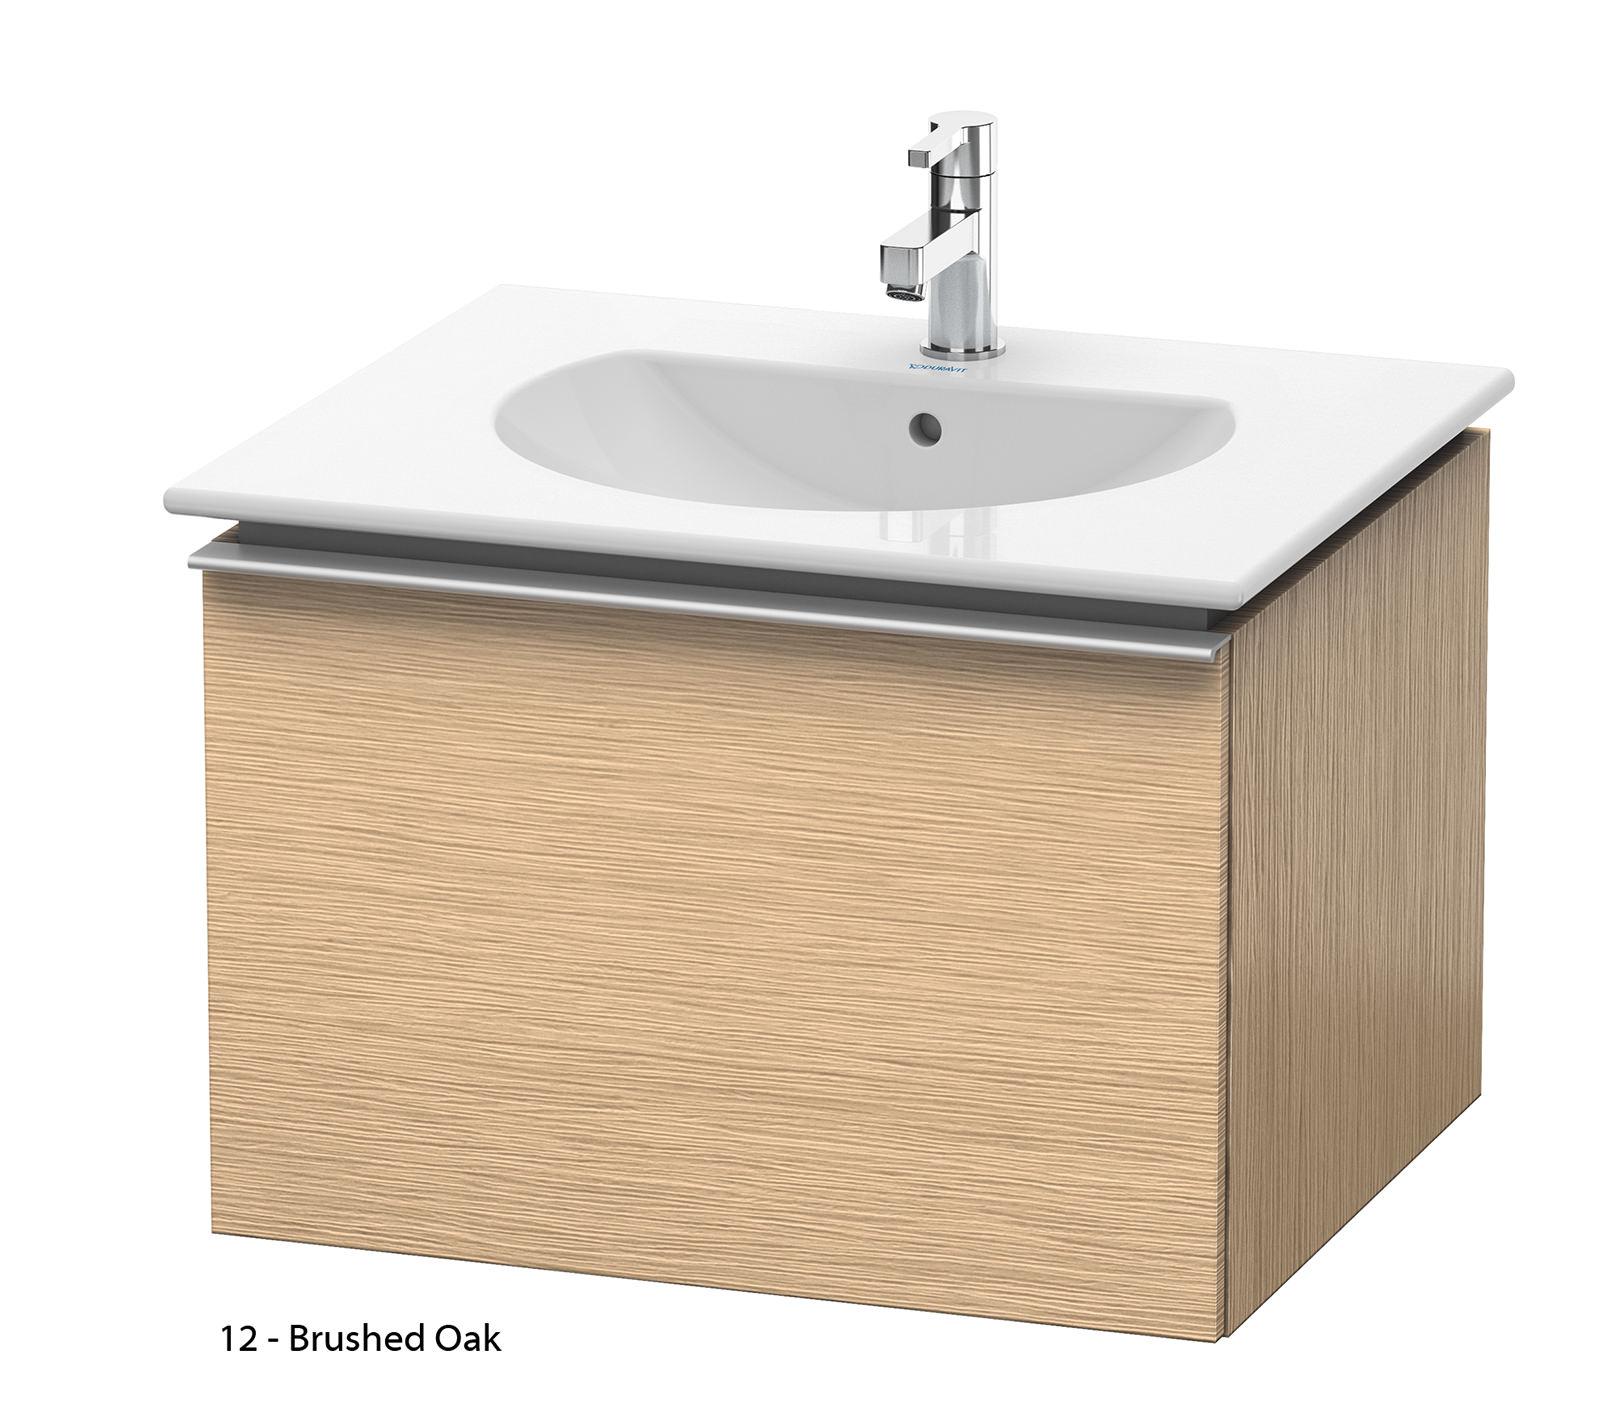 duravit darling new 600mm terra vanity unit with 630mm basin dn6460. Black Bedroom Furniture Sets. Home Design Ideas